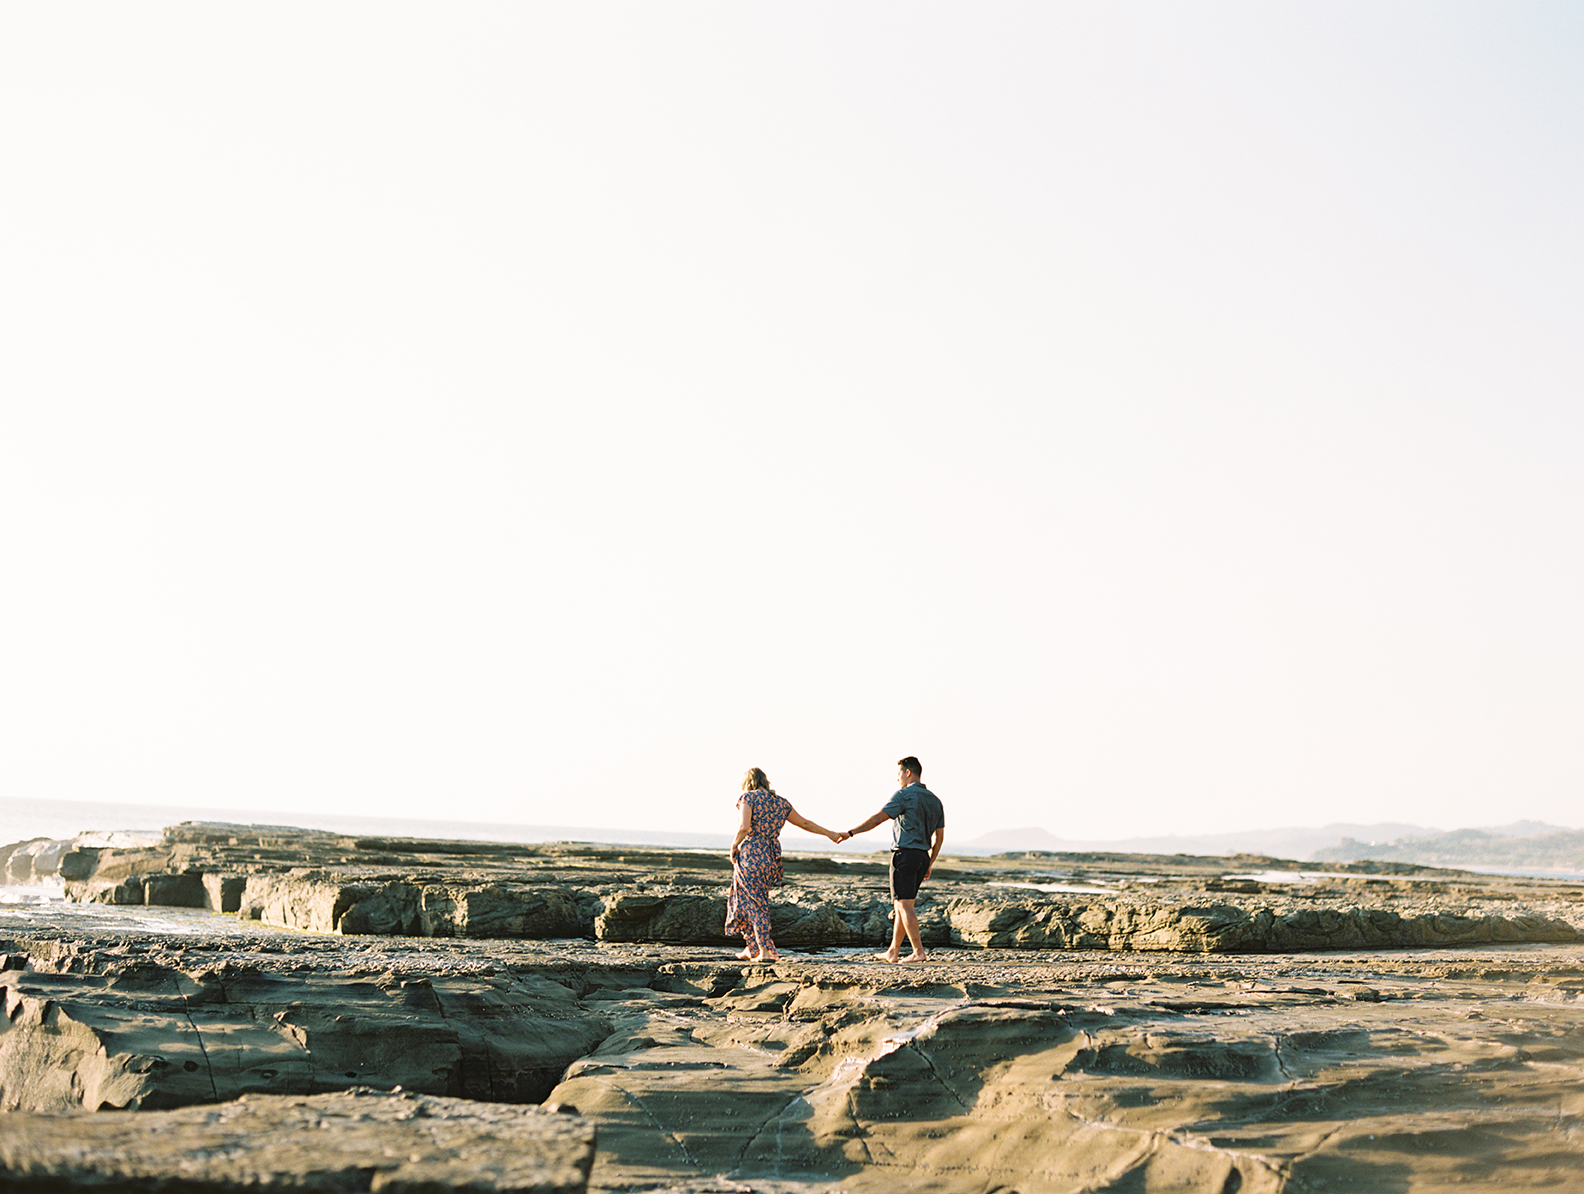 214-fine-art-film-photographer-wedding-engagement-jacob+cammye-destination-wedding-nicaragua-brumley & wells photography-rehearsal-dinner.jpg